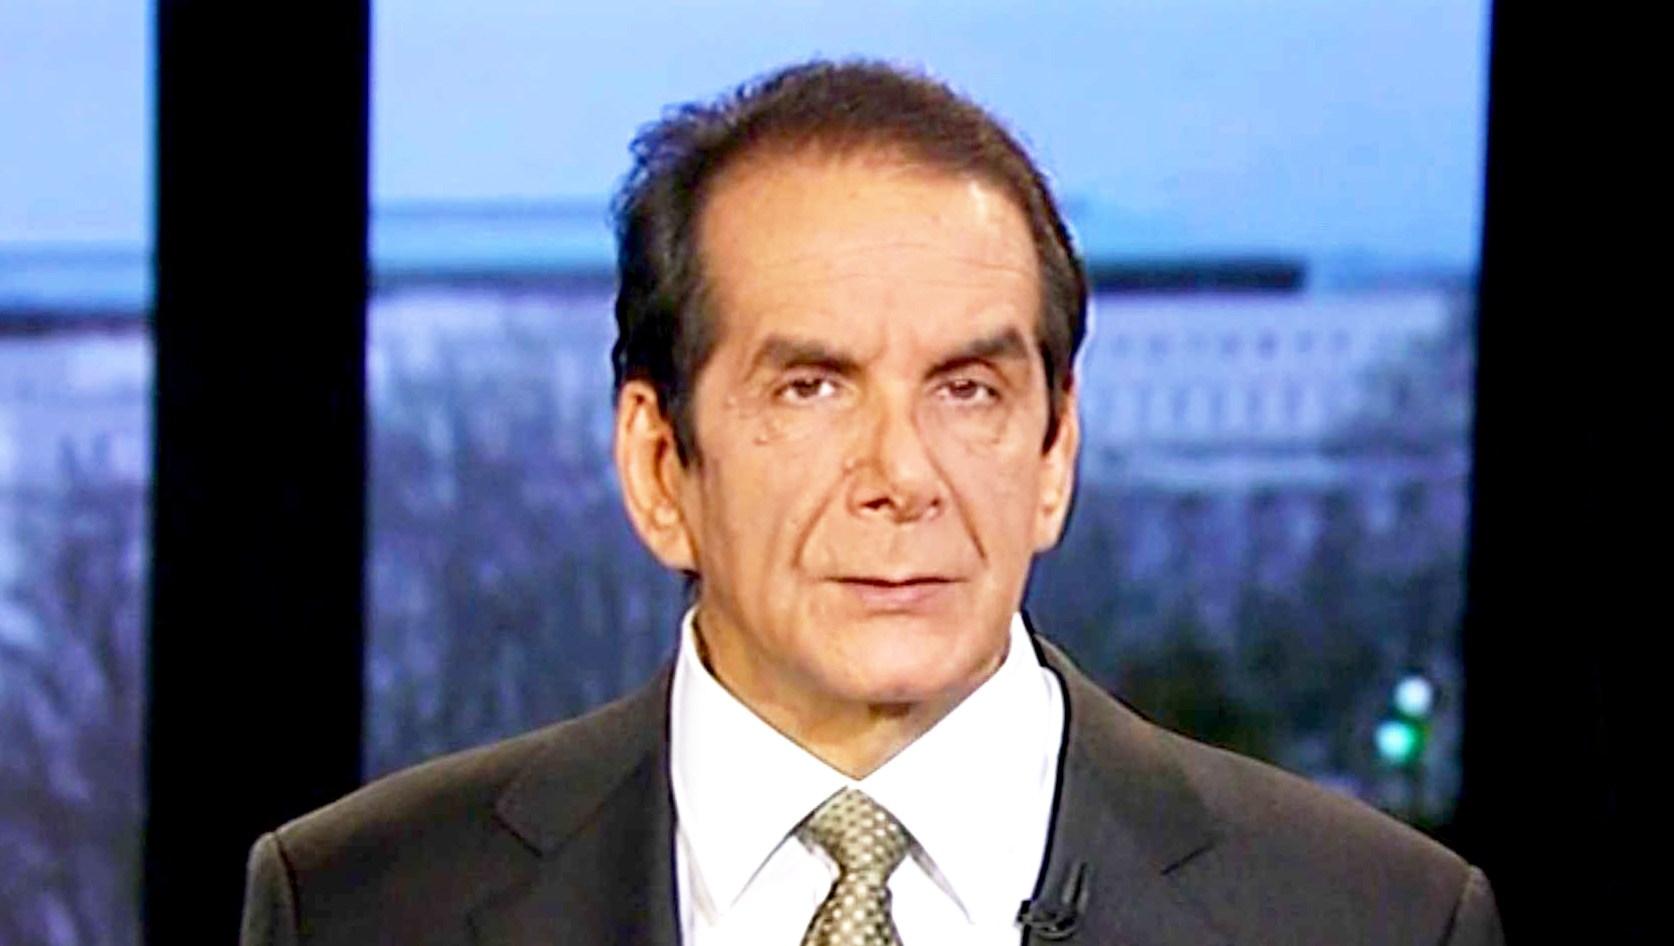 'Fox News' star Charles Krauthammer